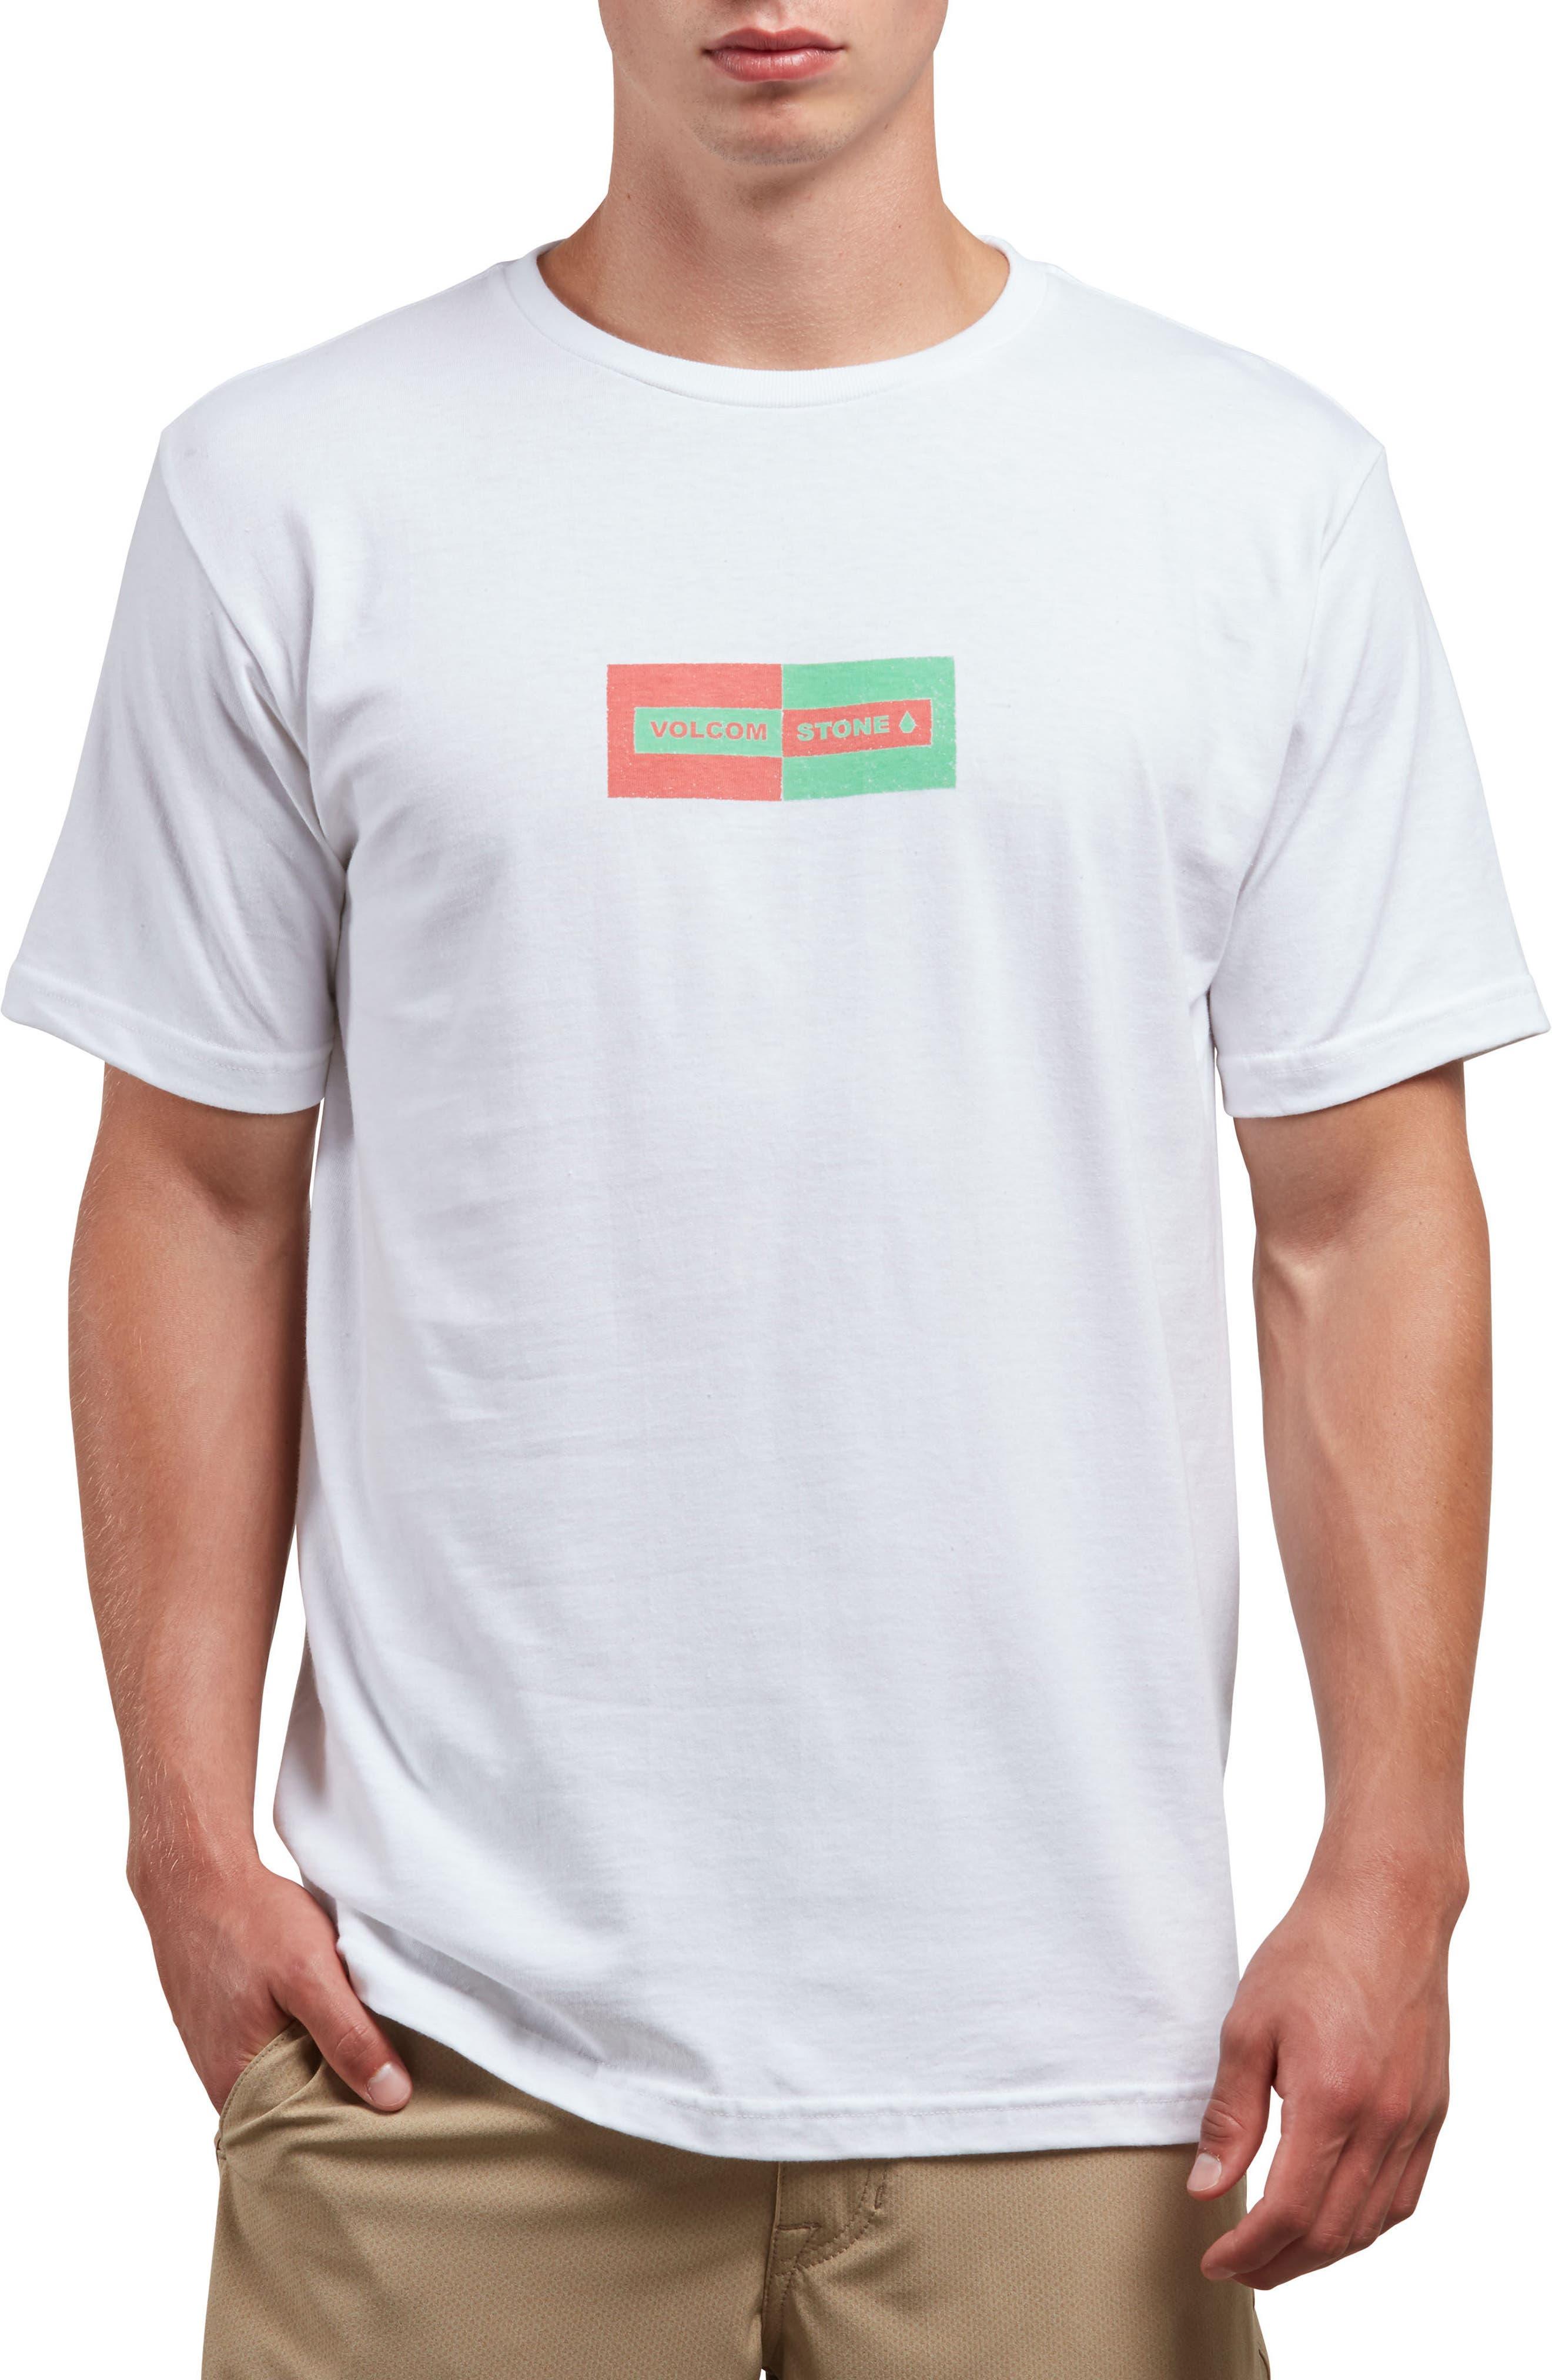 Same Difference T-Shirt,                             Main thumbnail 1, color,                             100